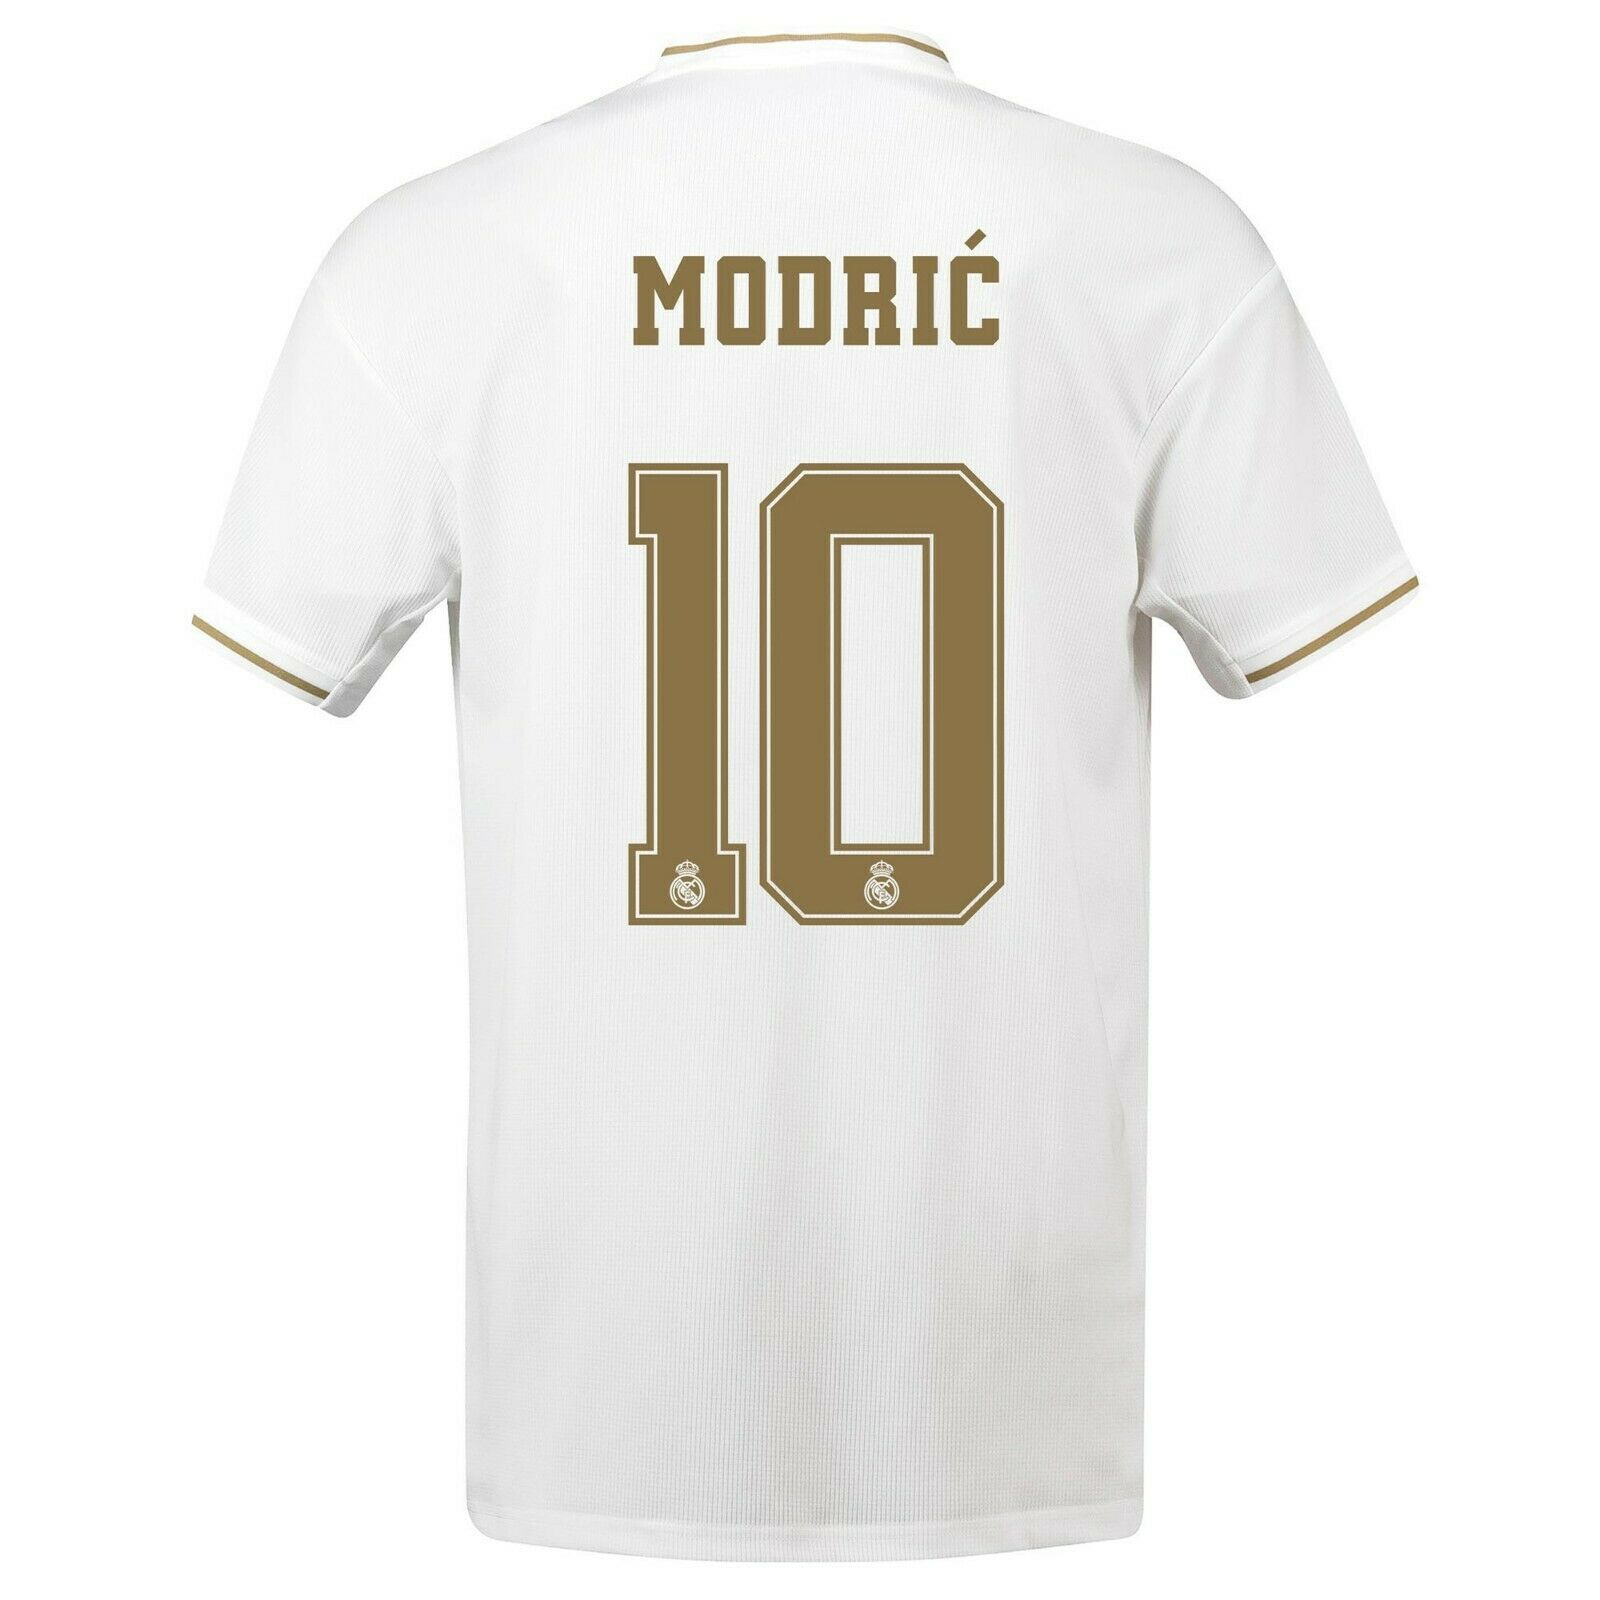 A4 mannens Media Real Madrid Home Shirt 2019-20 Gratis Print Modric 10